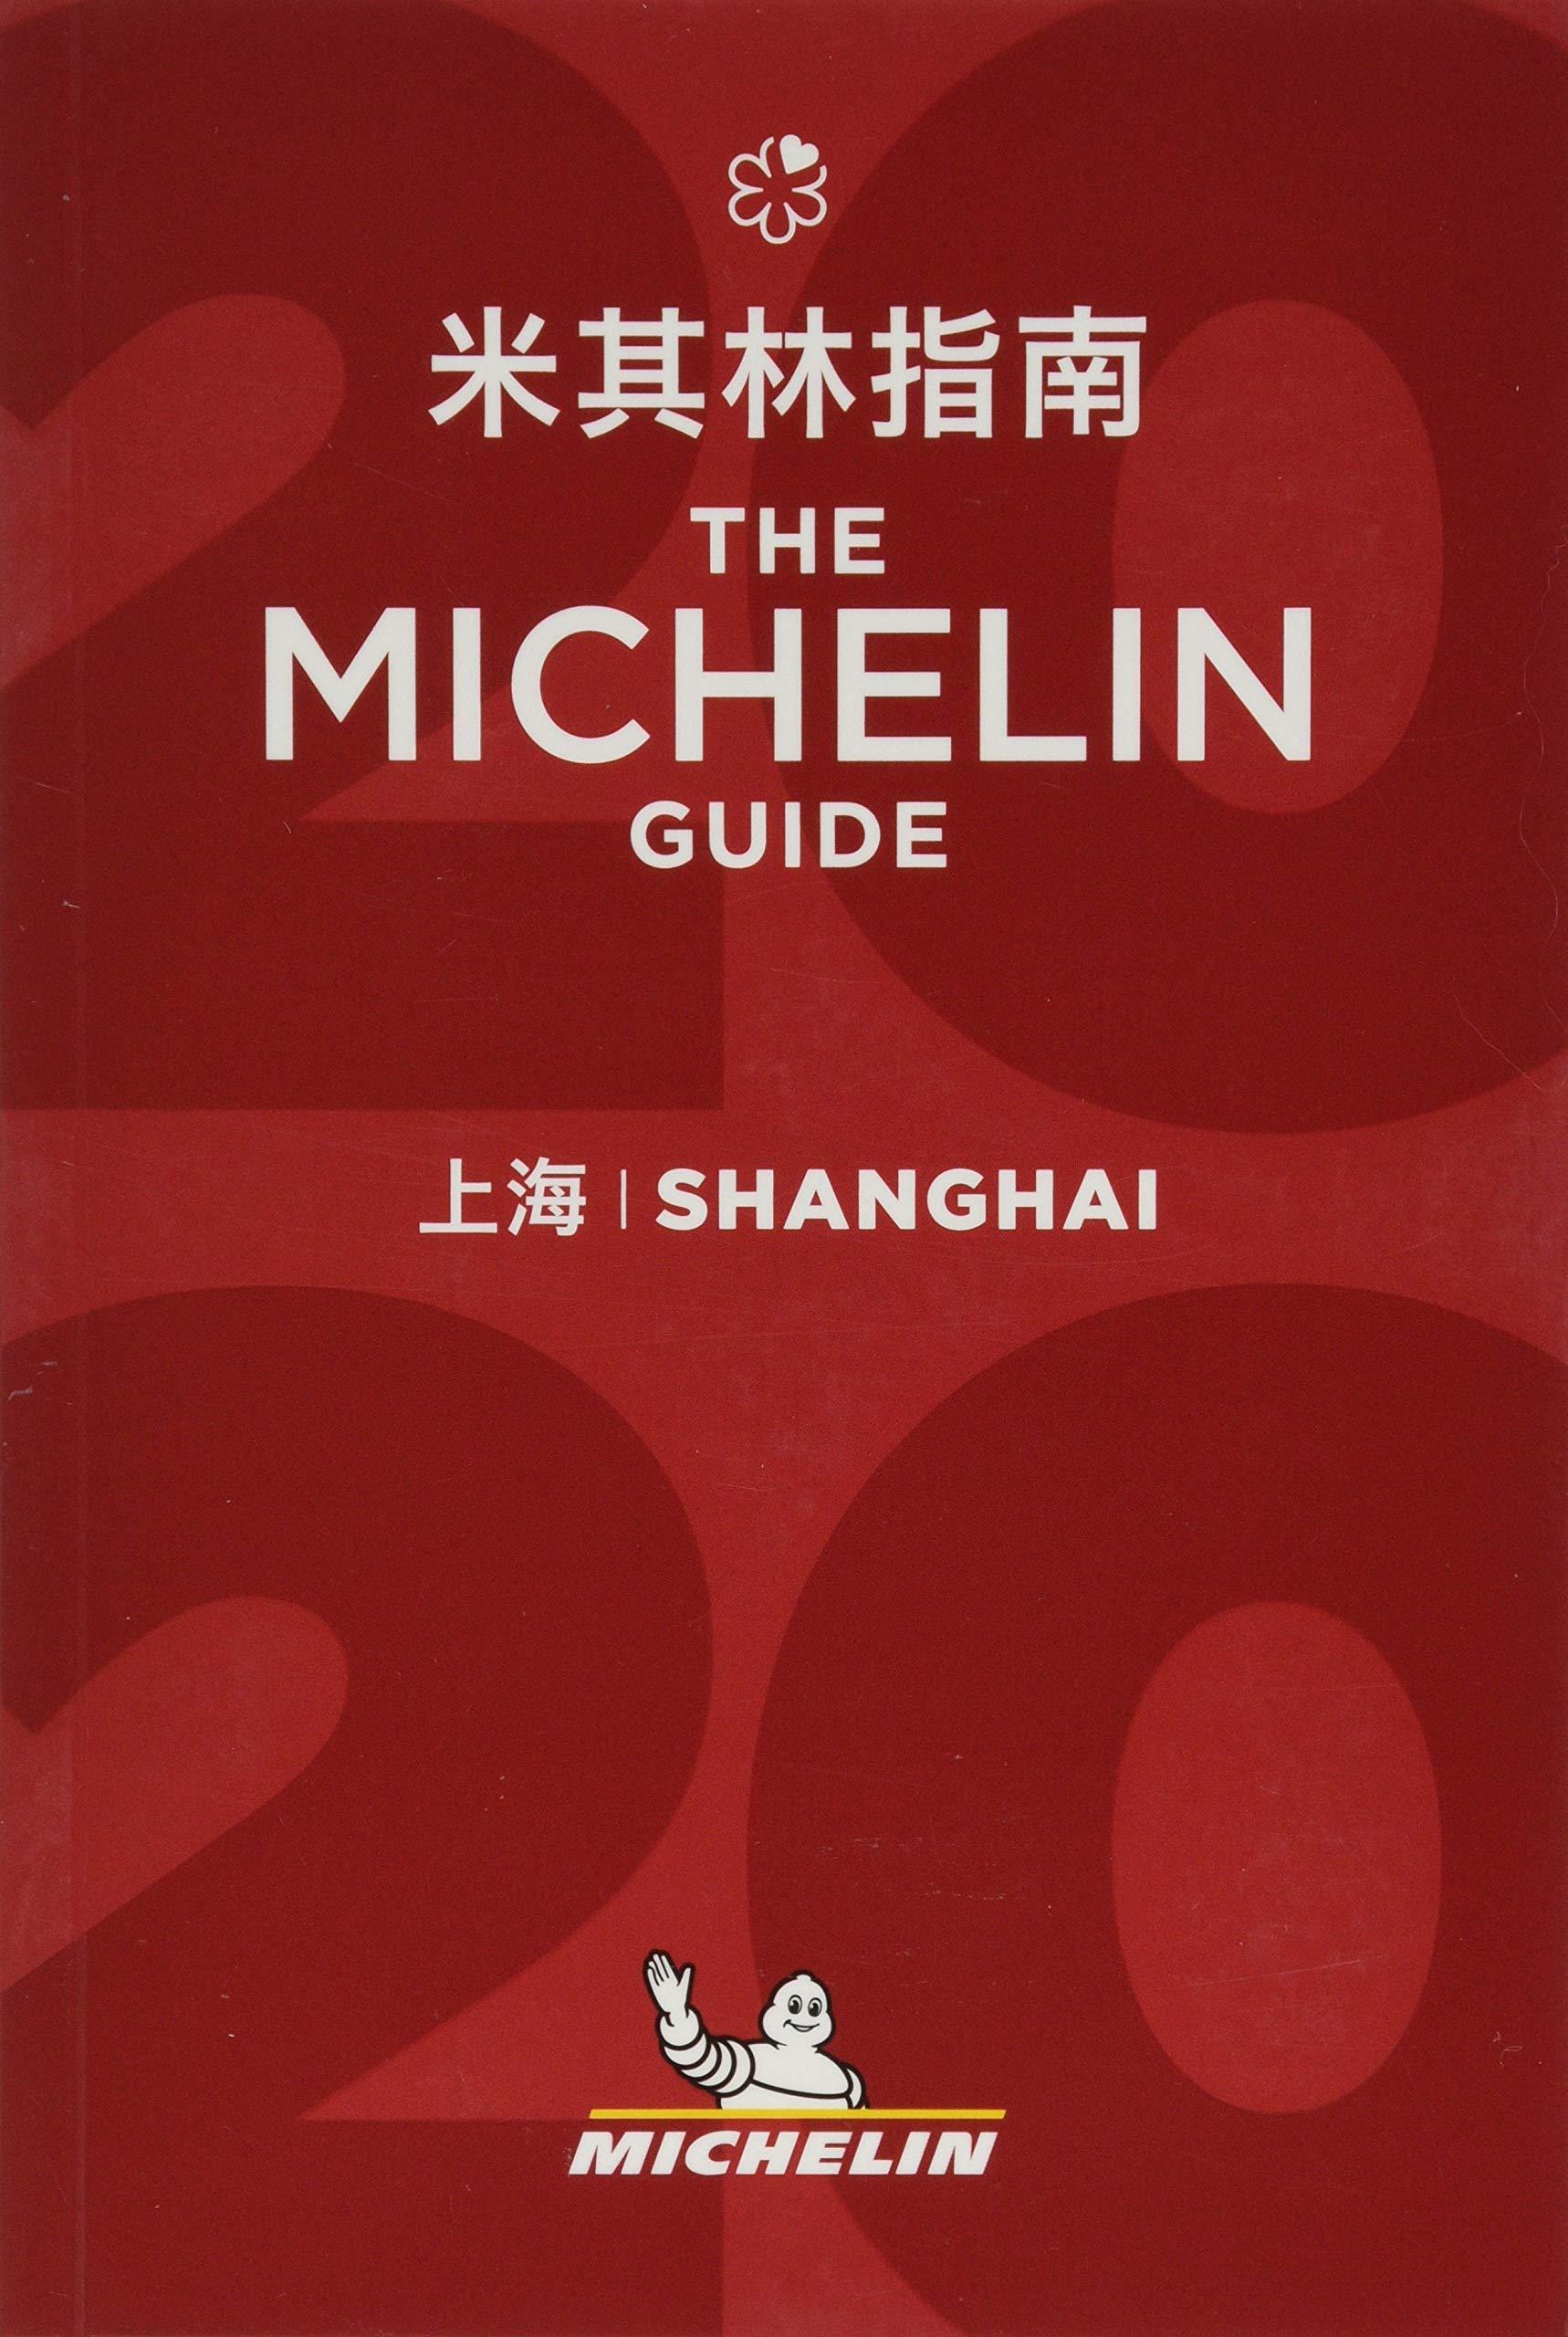 Shanghai - The MICHELIN Guide 2020 Michelin Hotel & Restaurant ...